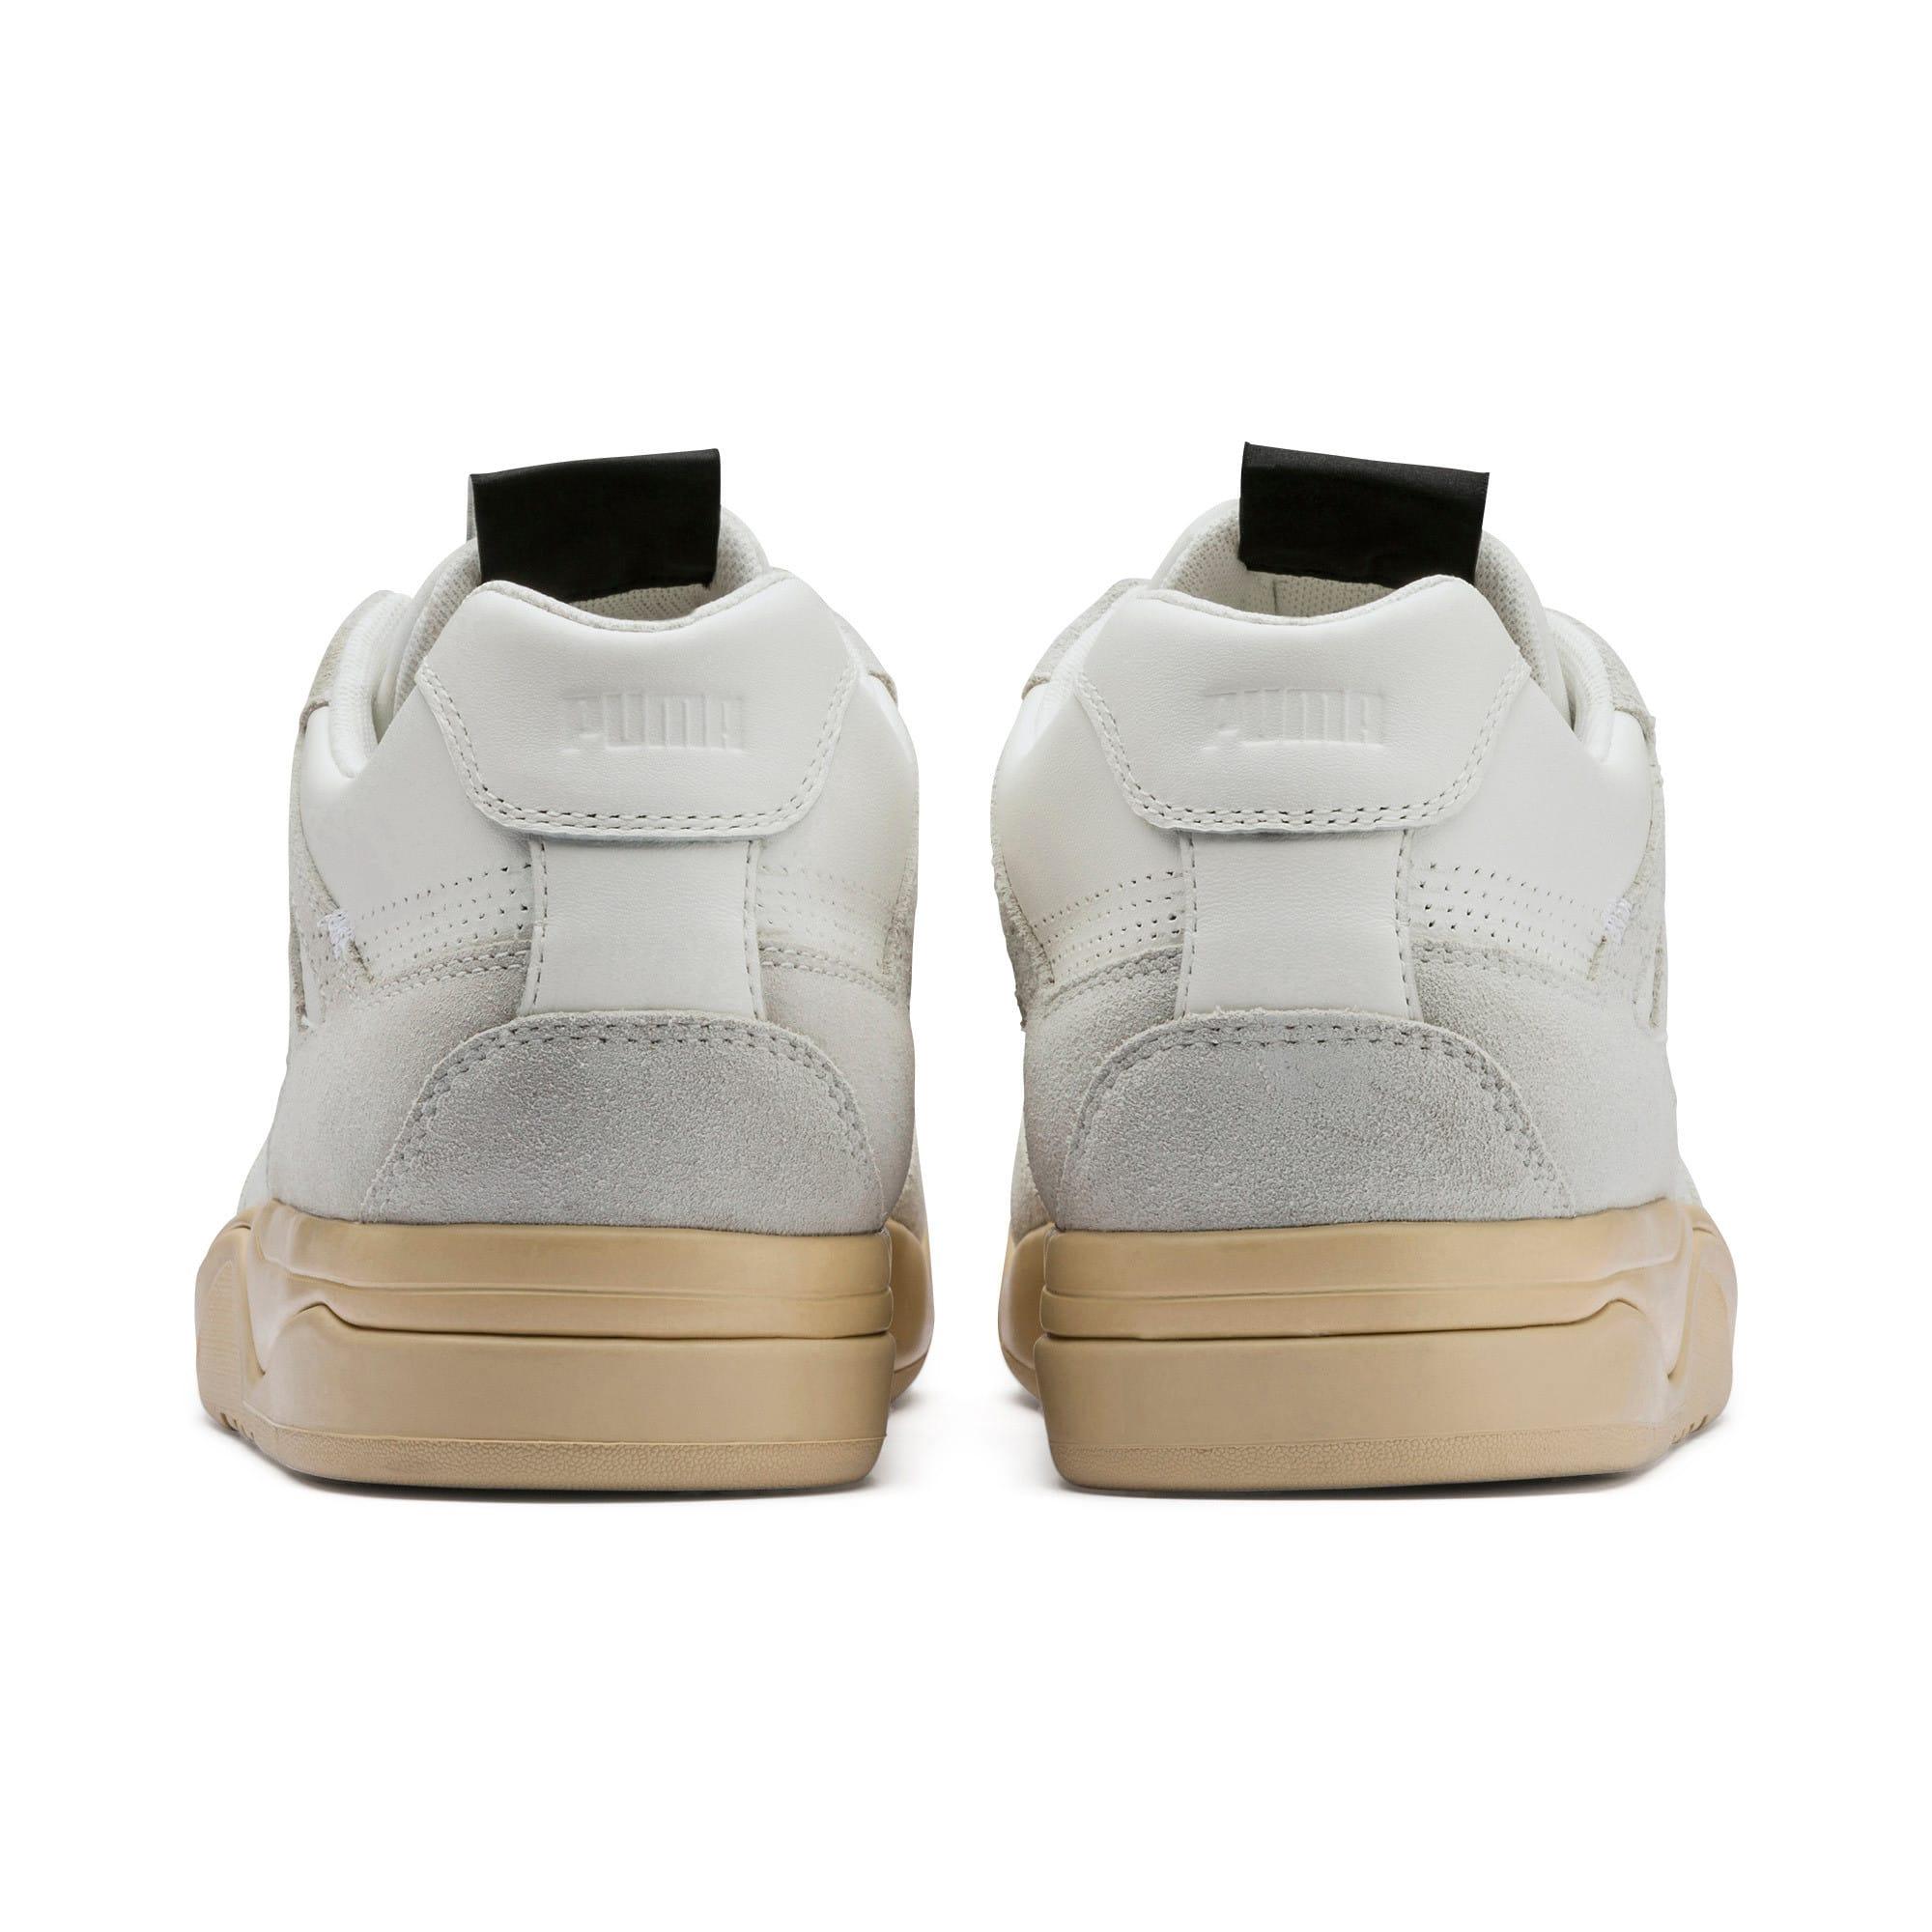 Thumbnail 3 of PUMA x RHUDE Palace Guard Sneakers, Star White-WINDCHIME, medium